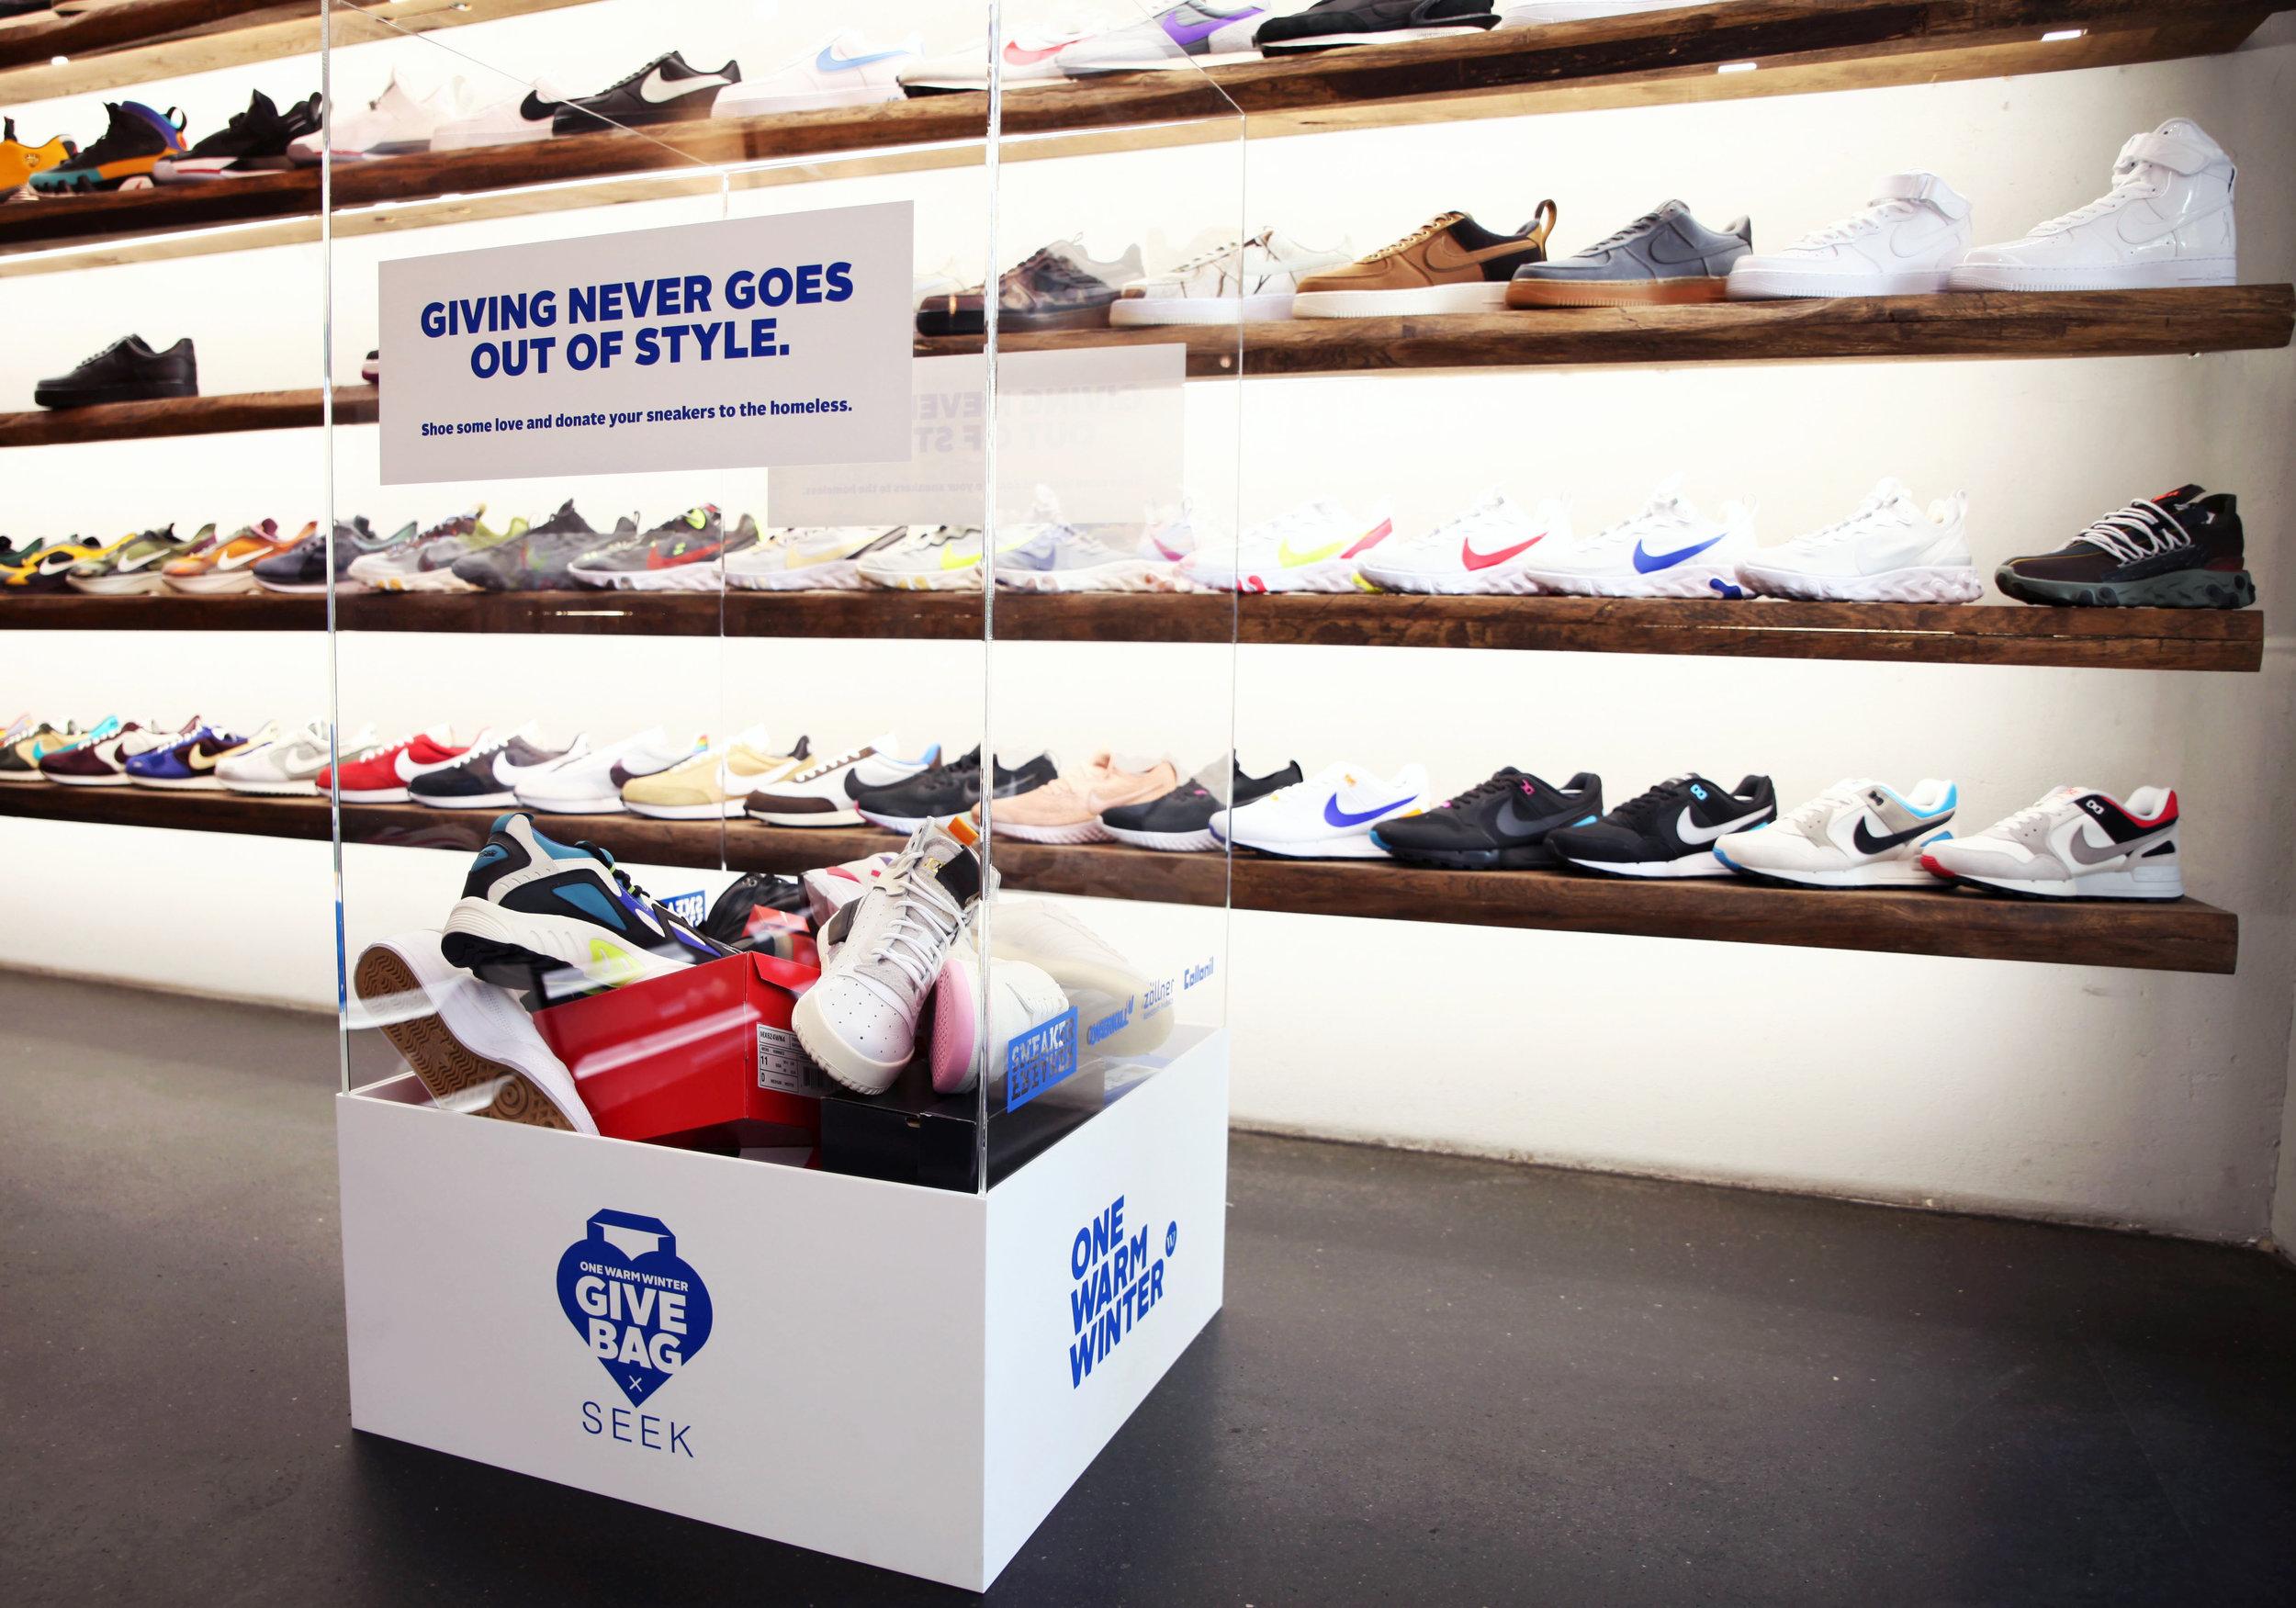 OWW_GiveBAG_SEEK_SneakerEdition_Box2.jpg